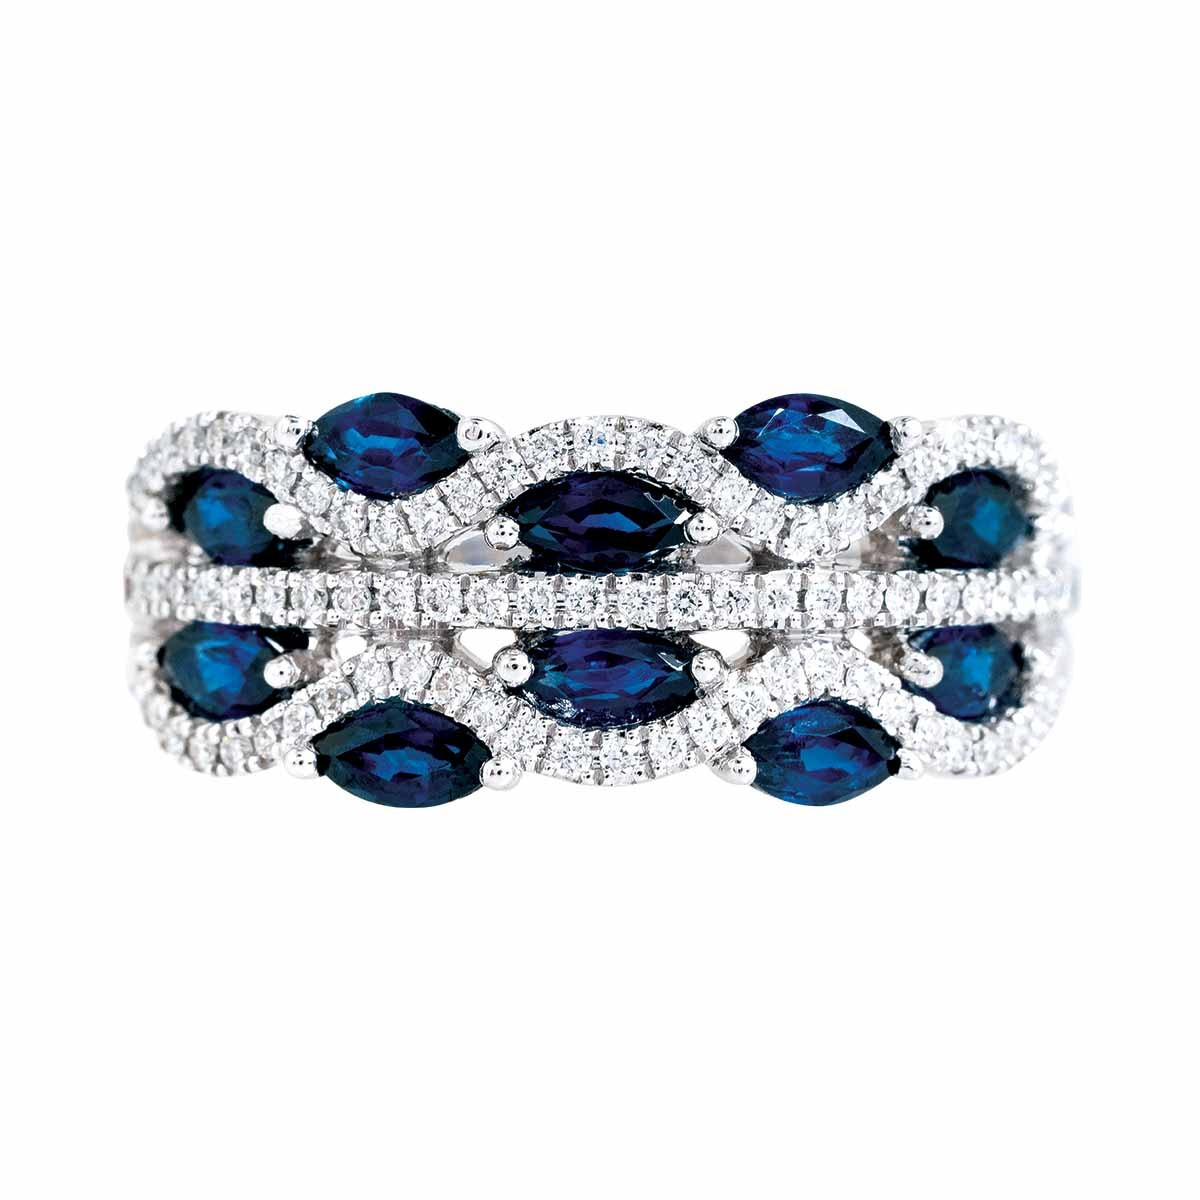 New Asba & Dangler 1.28 CTW Blue Sapphire & Diamond Band